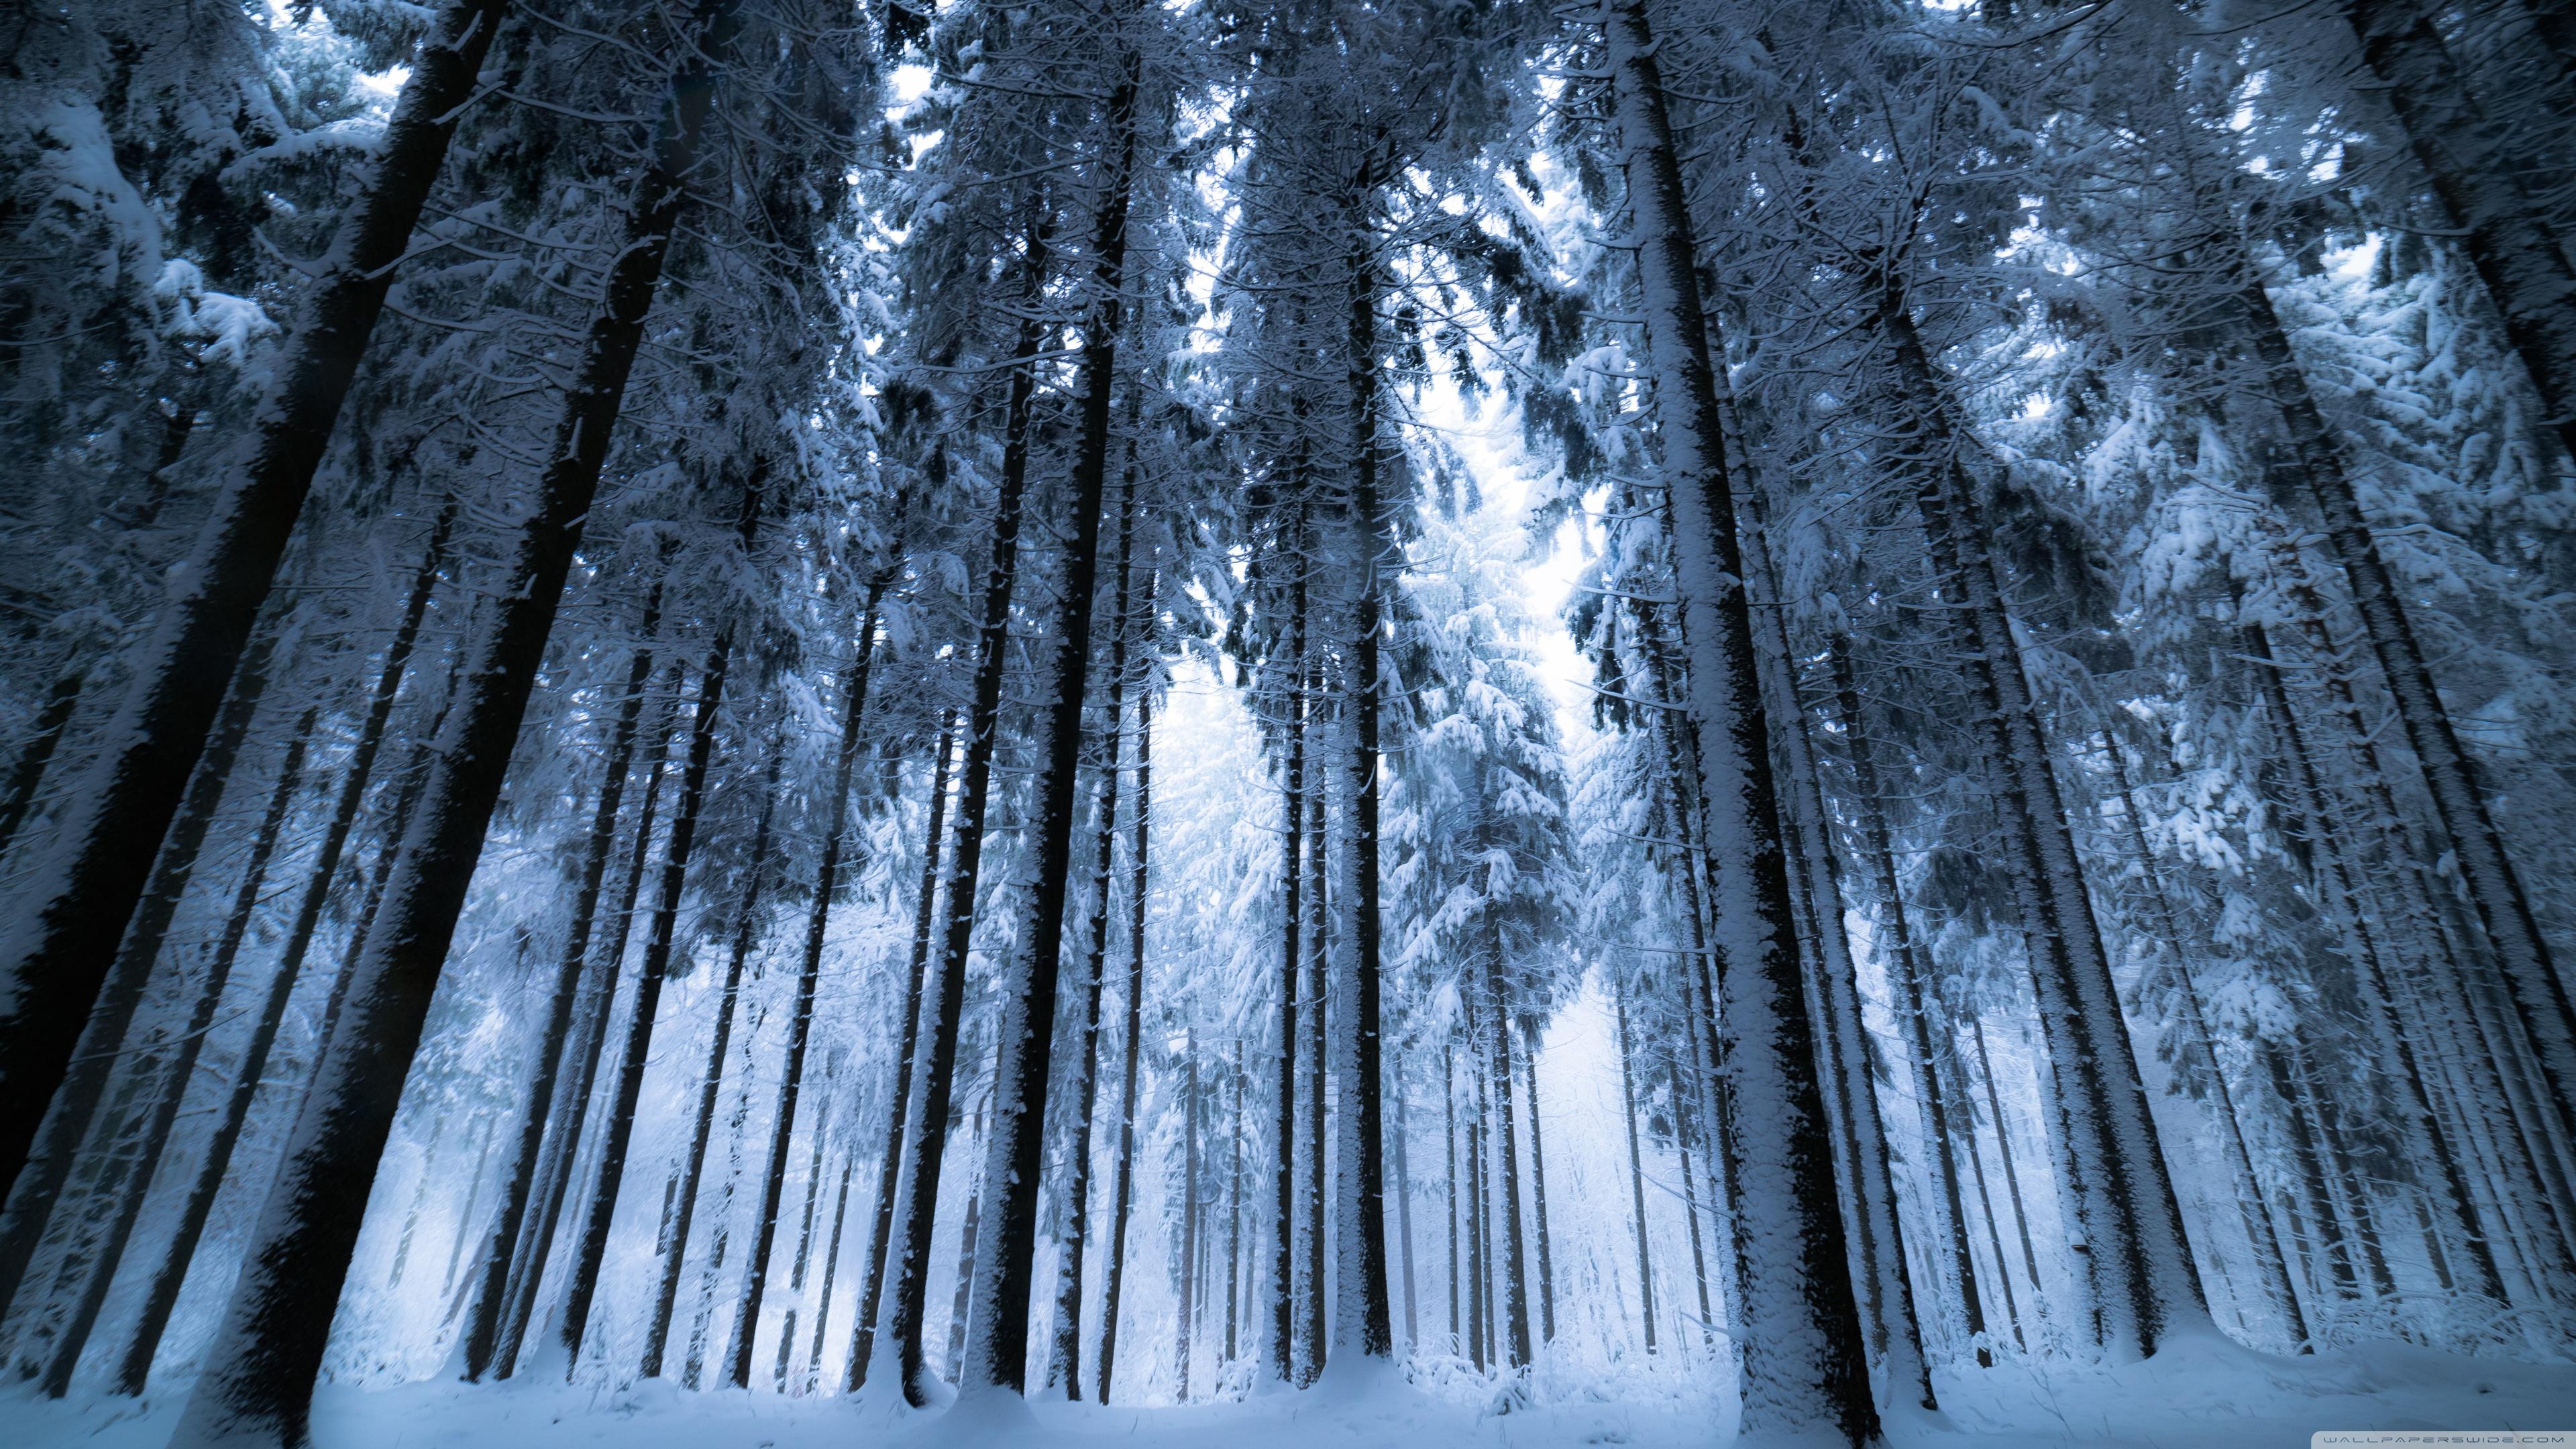 Dark Winter Forest Wallpaper Hd Resolution Winter Forest Wallpaper 4k 3840x2160 Wallpaper Teahub Io